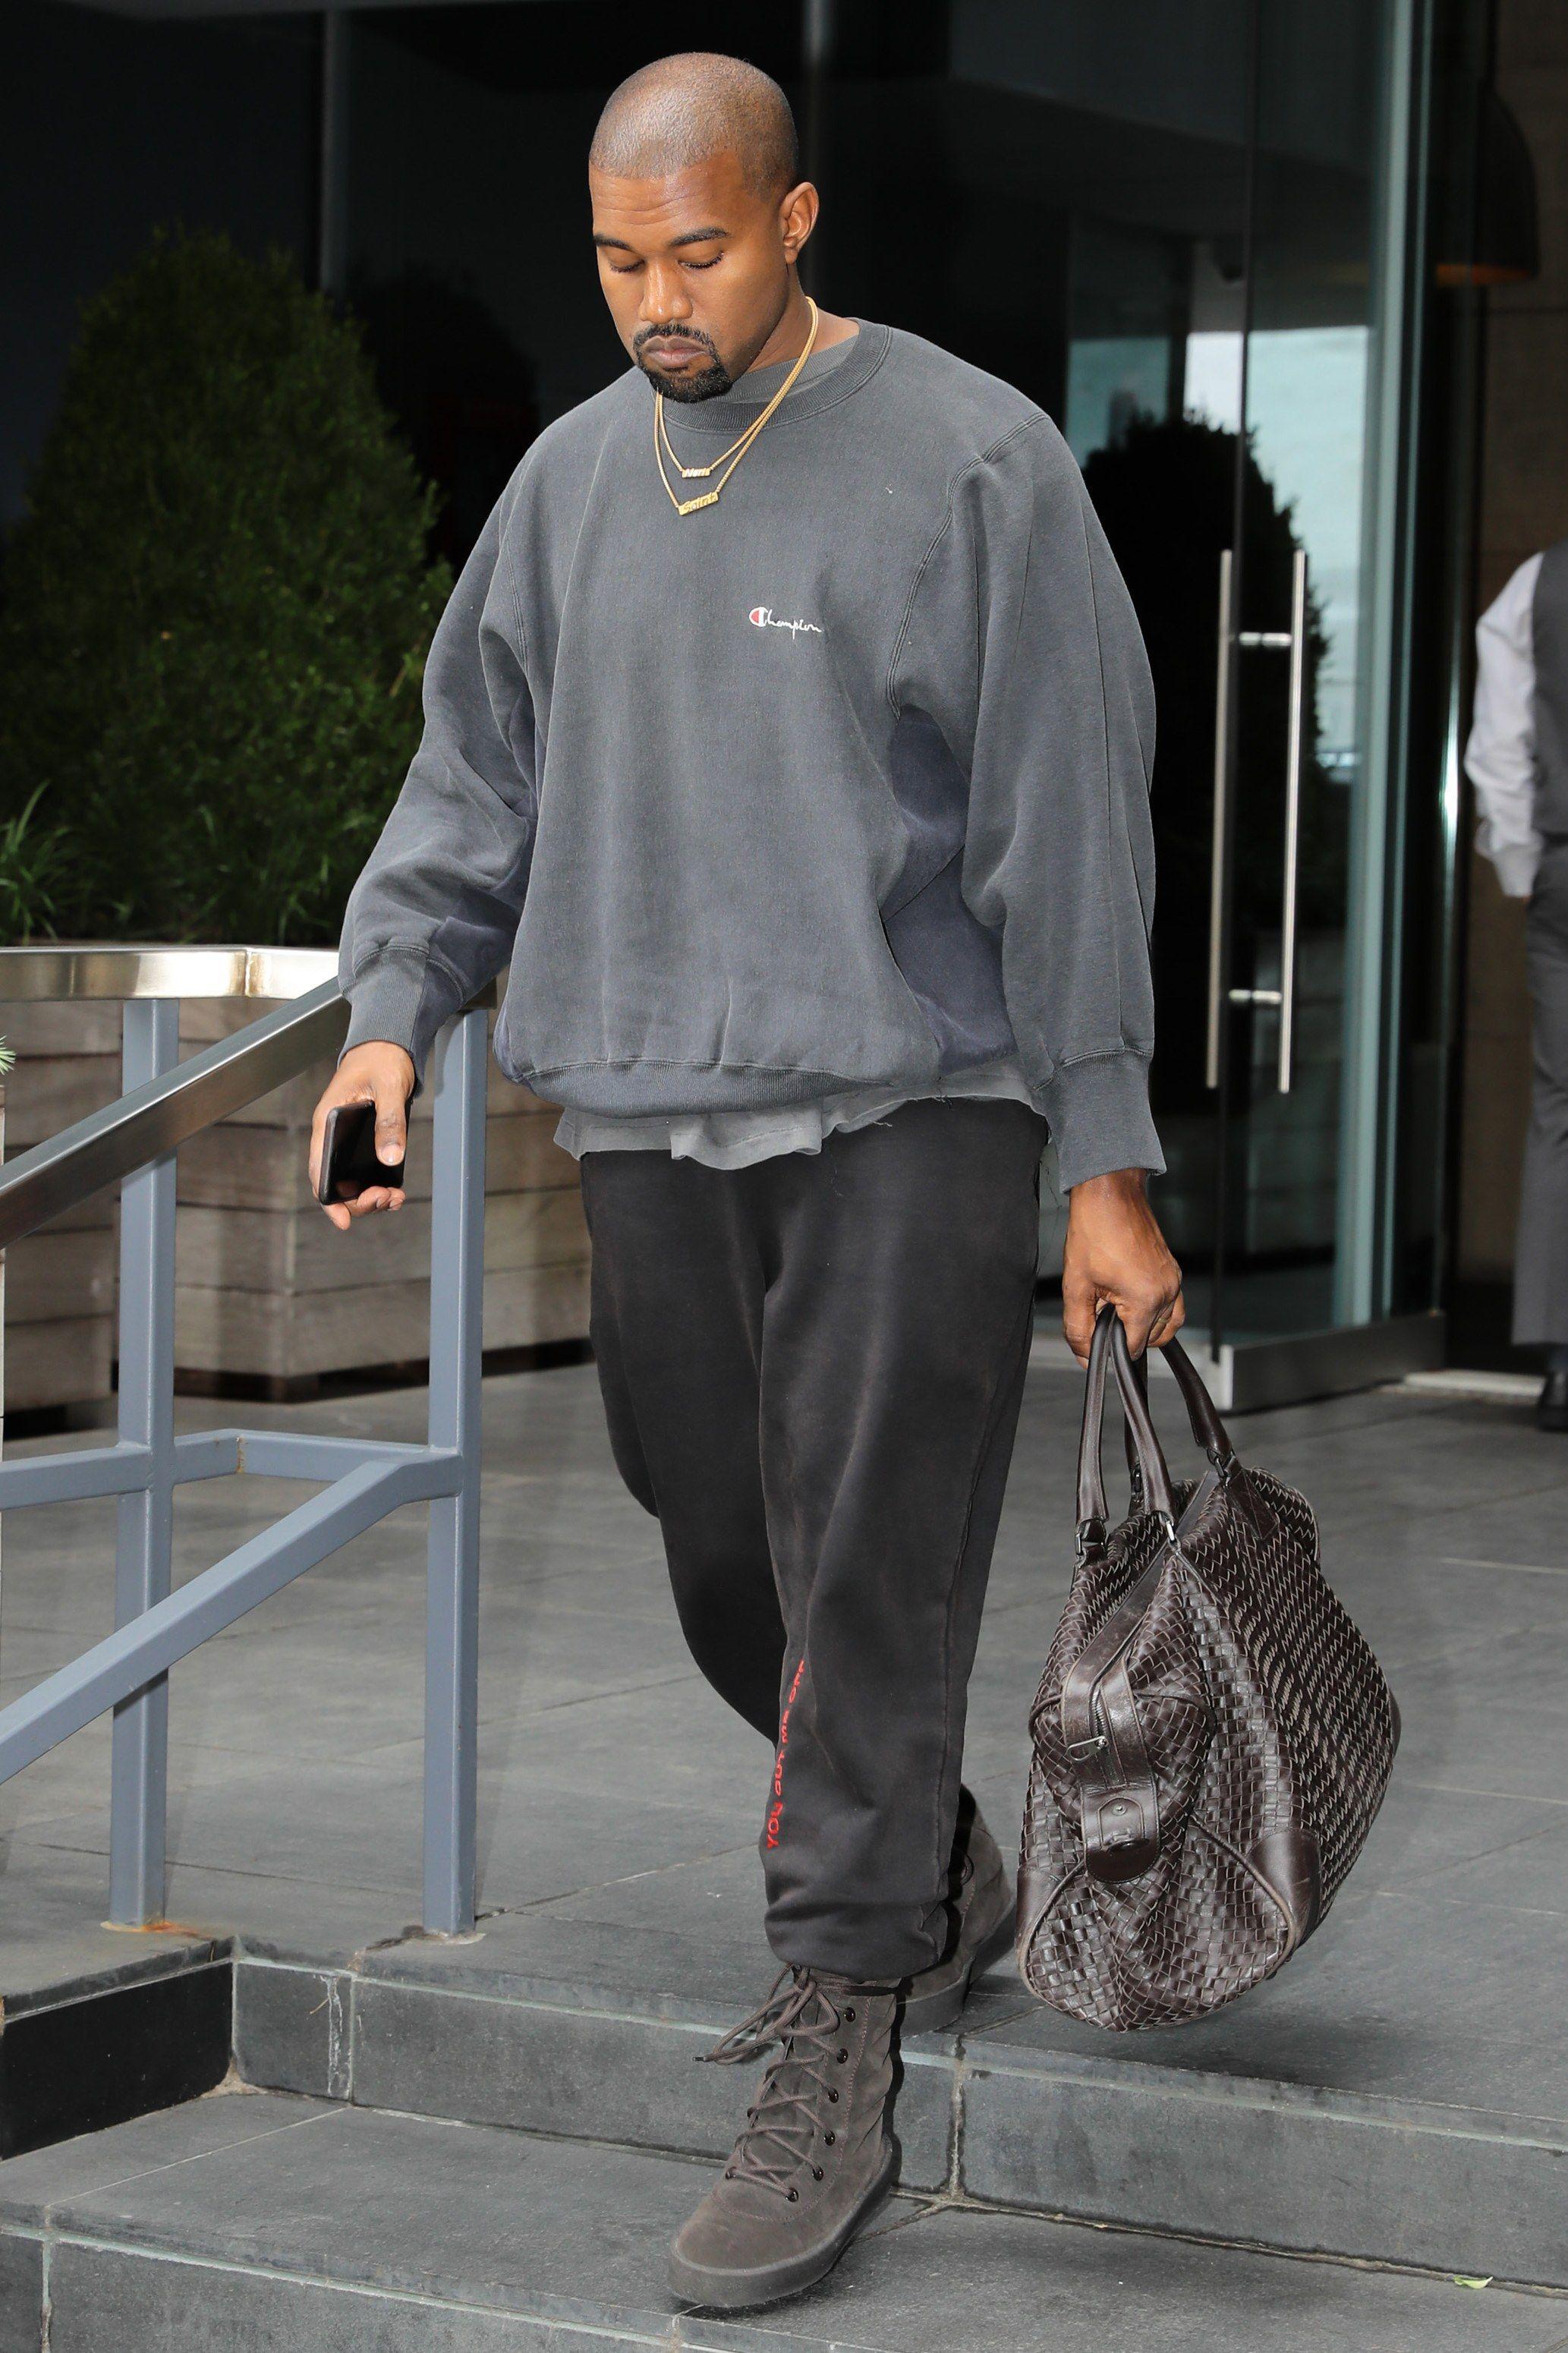 Pin By Viviana On Lookbook Kanye West Outfits Kanye West Style Kanye Fashion